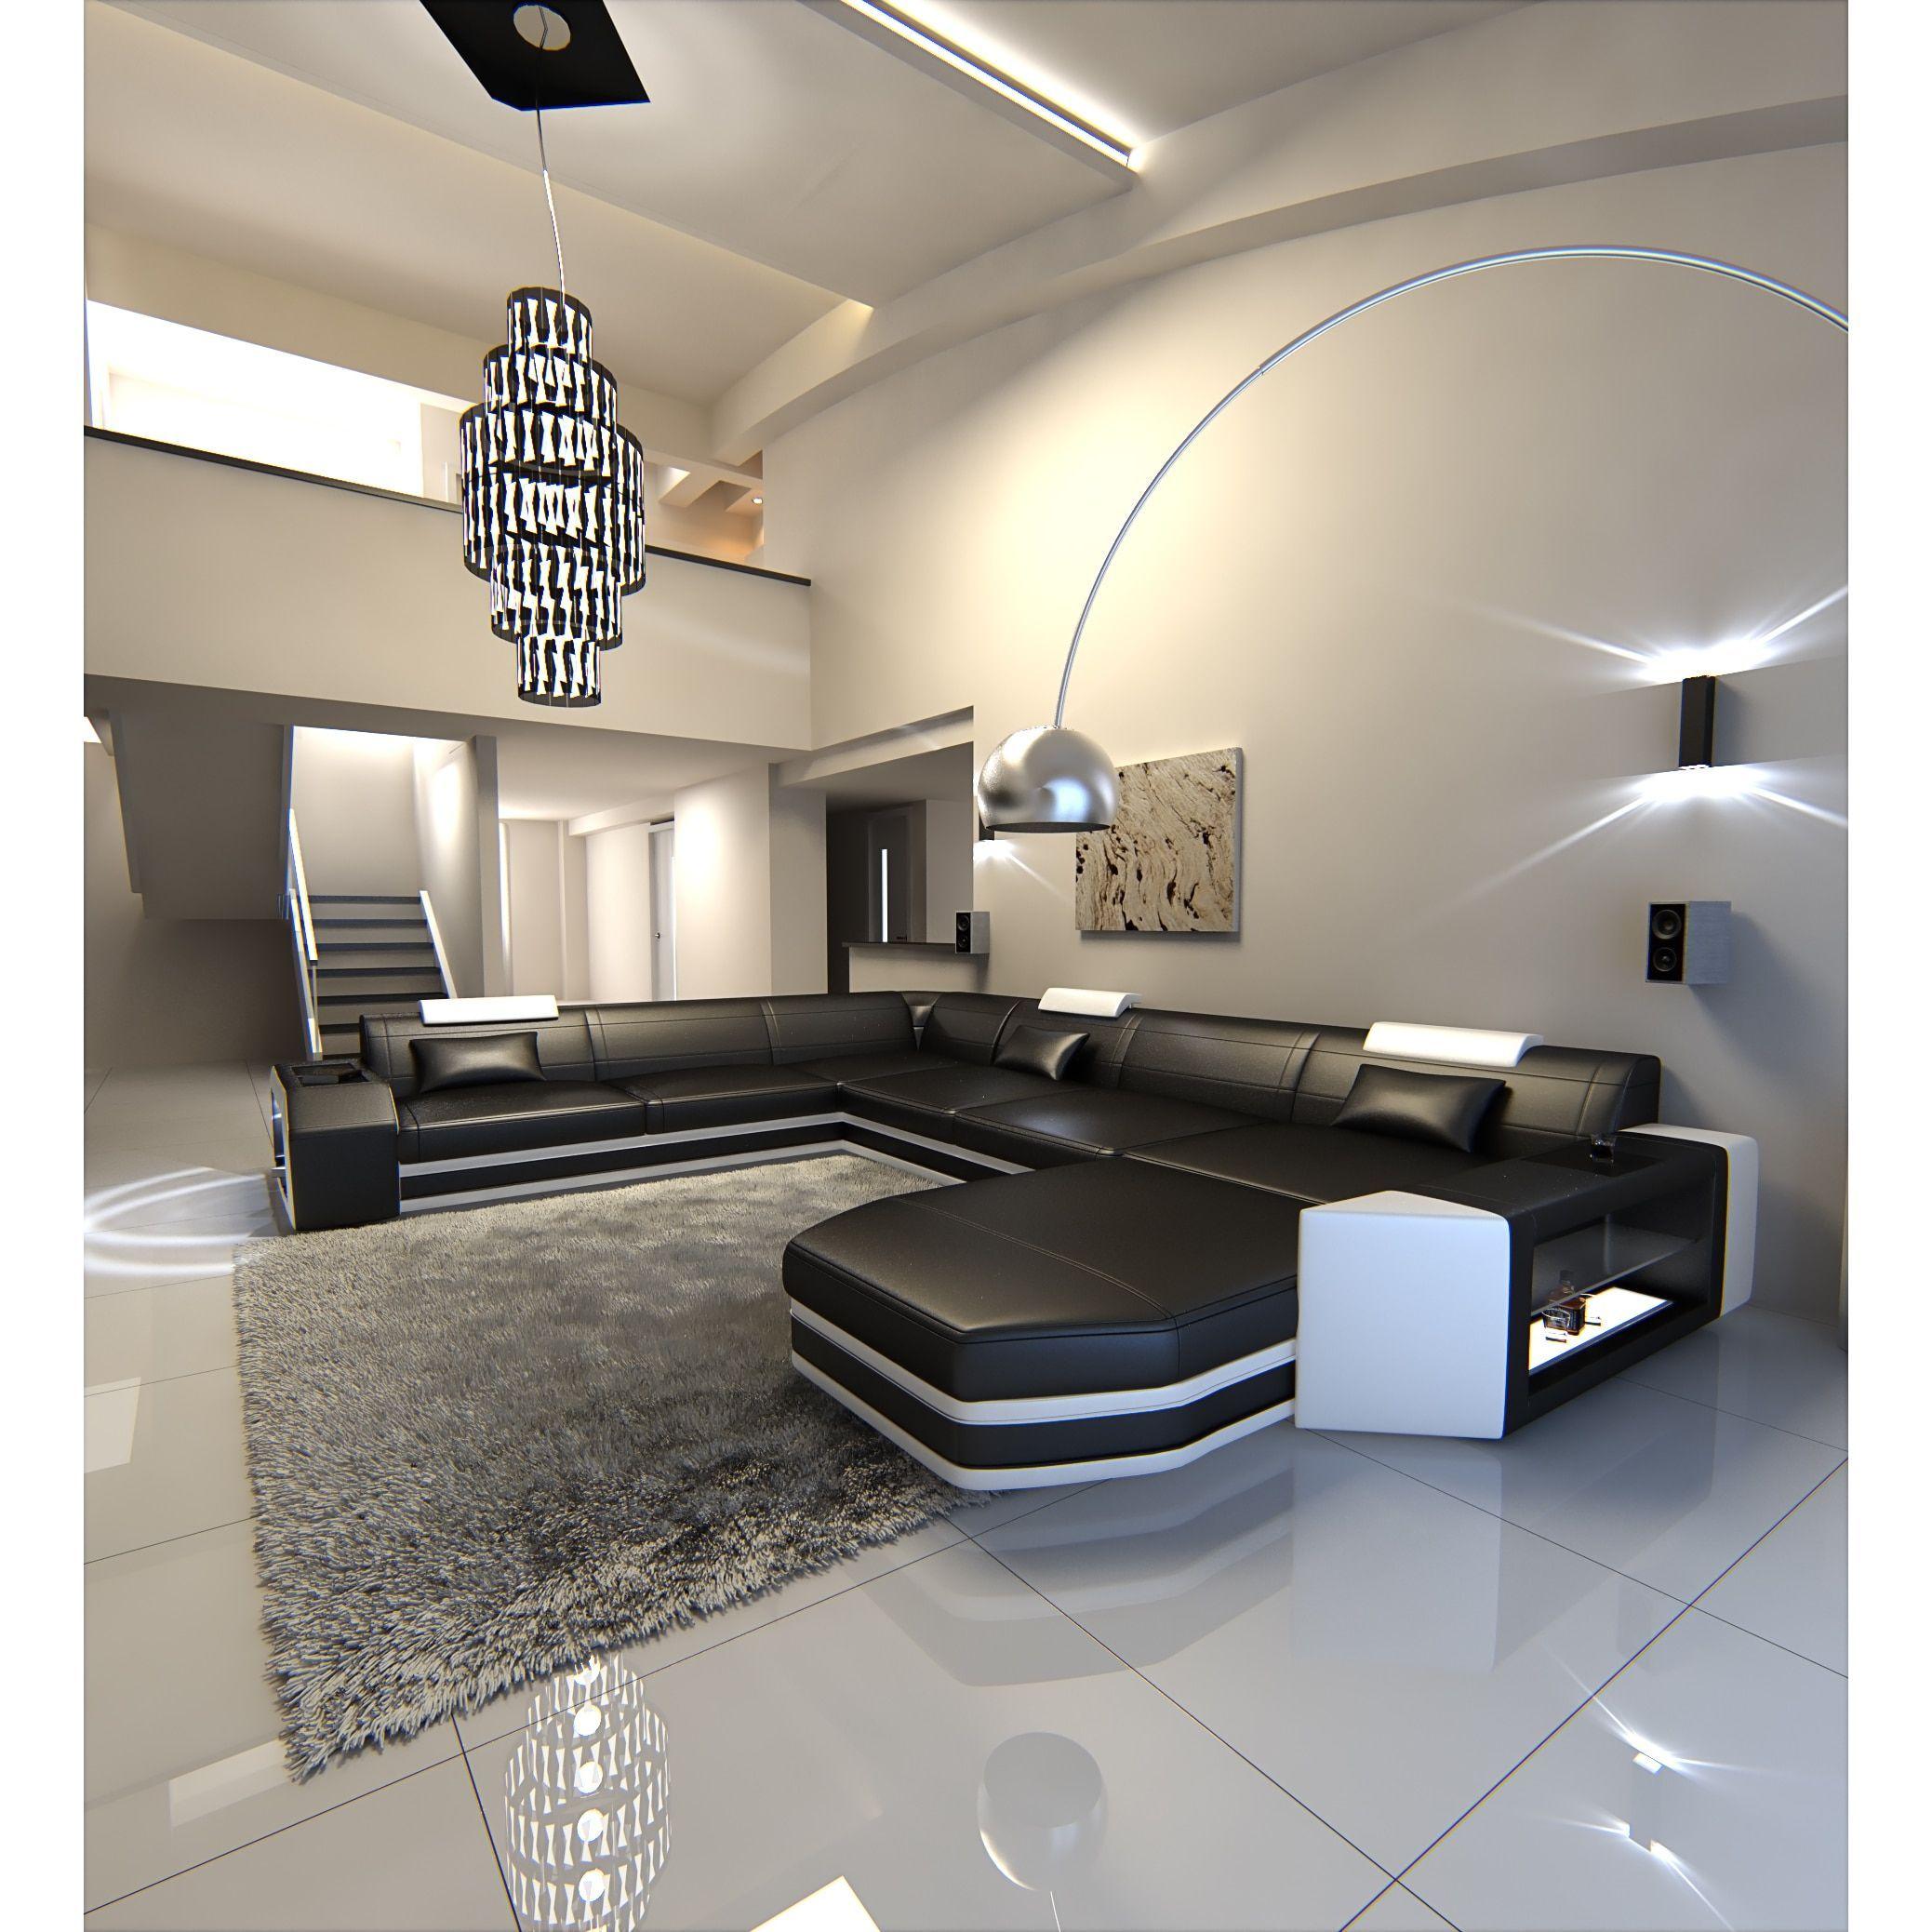 Modern U Shaped Sectional Sofa Dallas XXL With LED Lights ...